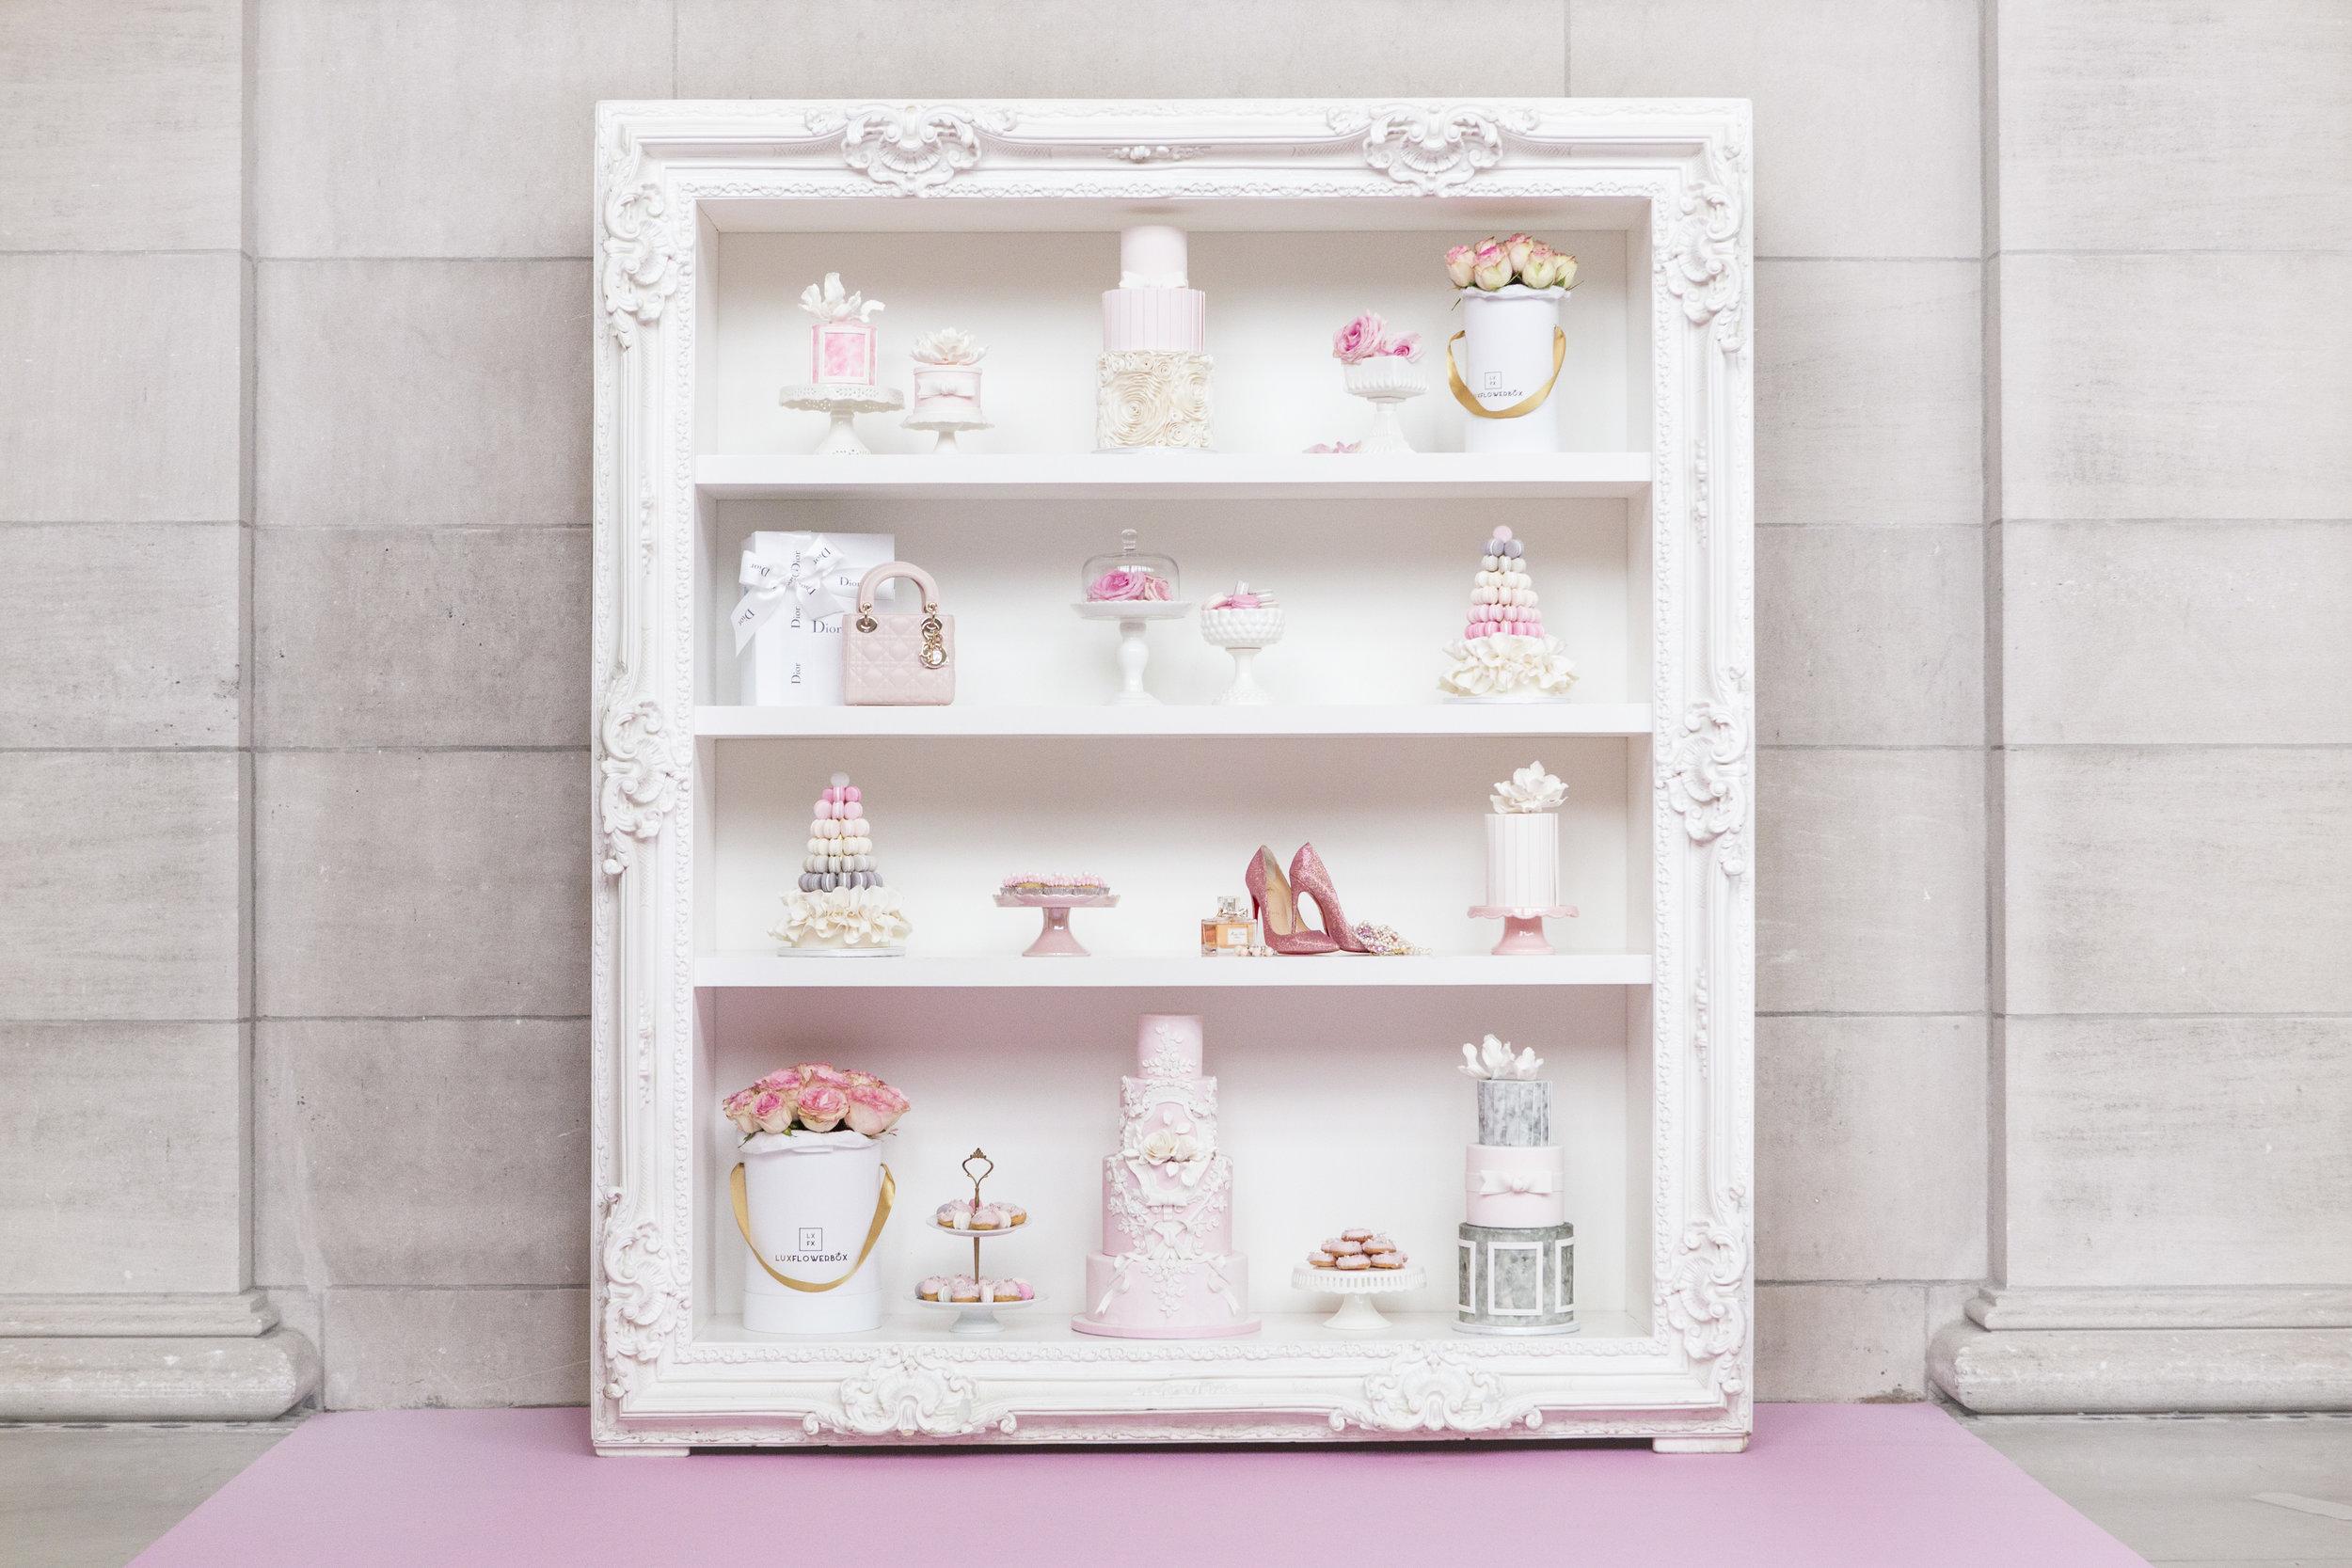 August In Bloom - Sweet Shelf - Dior Darling (Wedluxe)